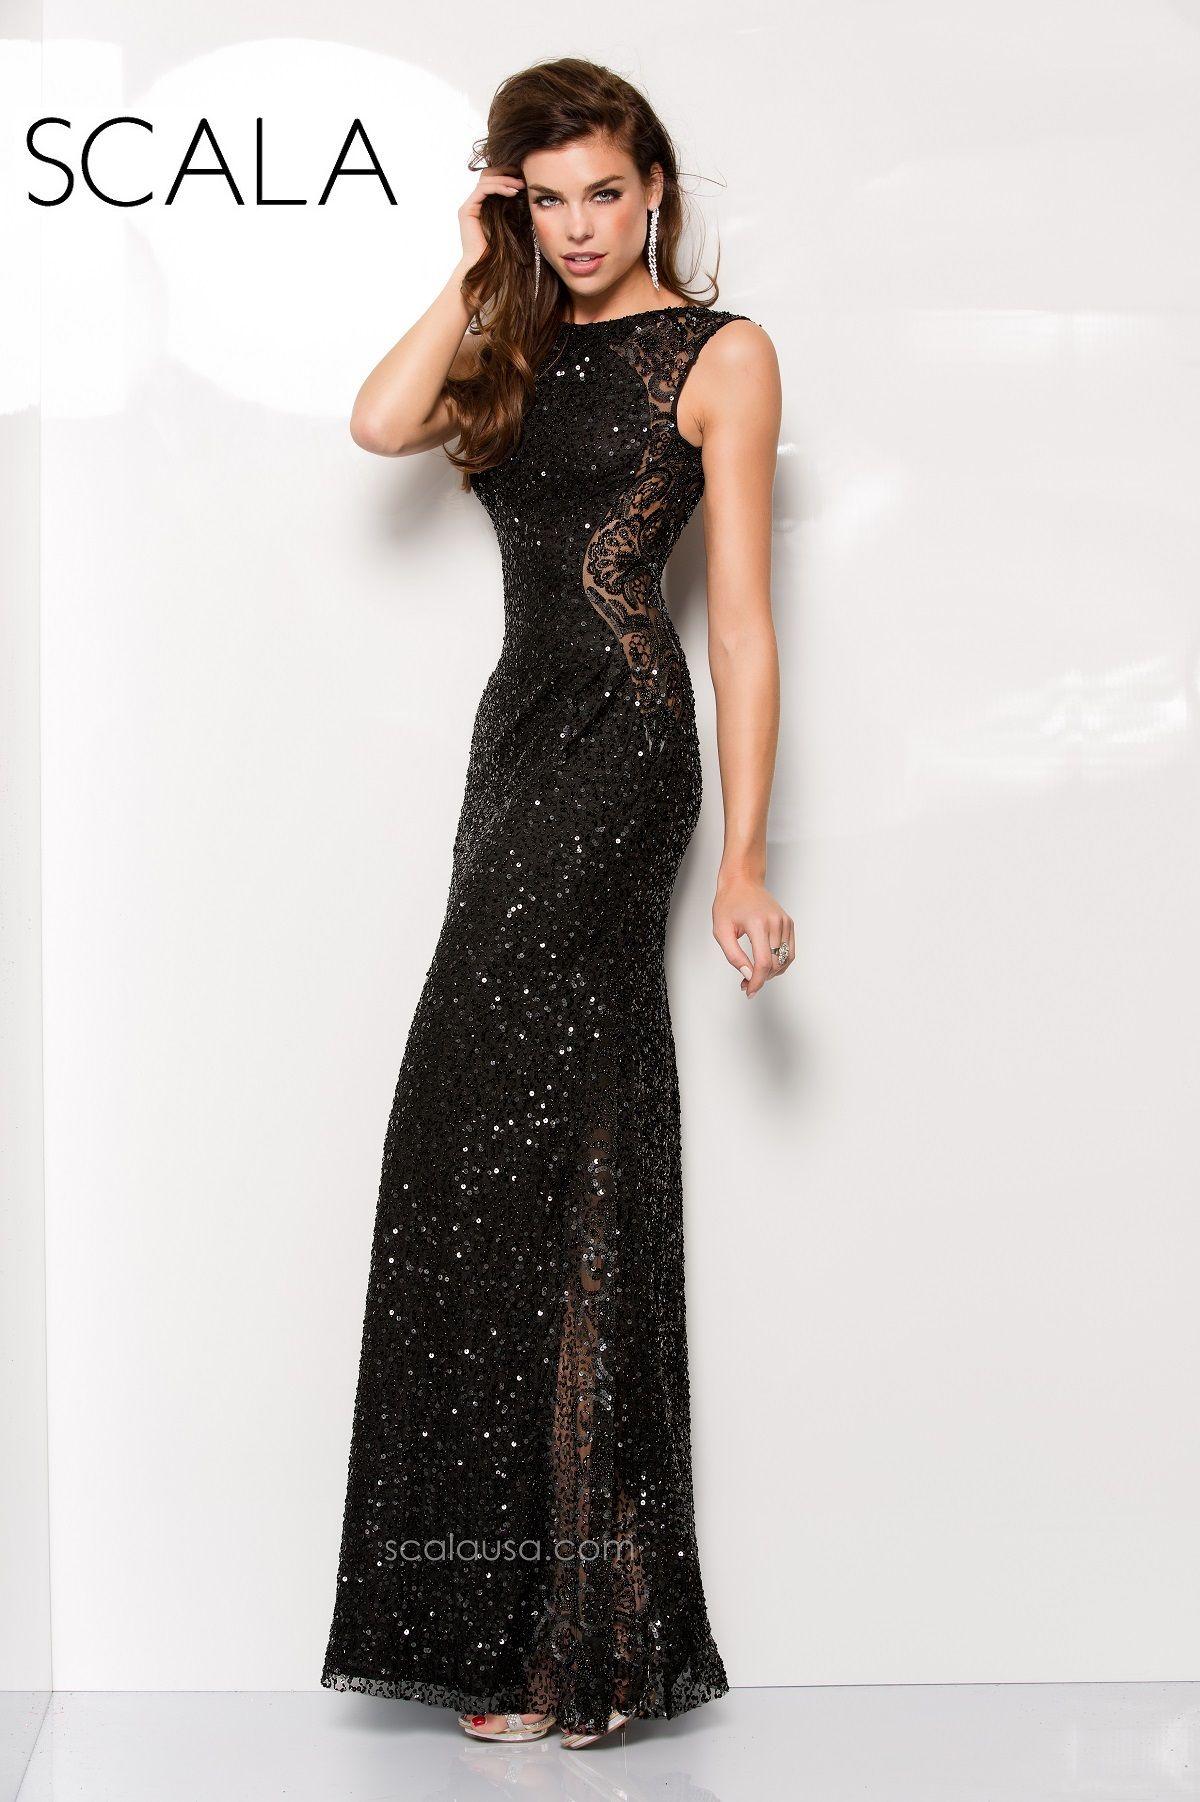 Scala style black promk spring prom dress